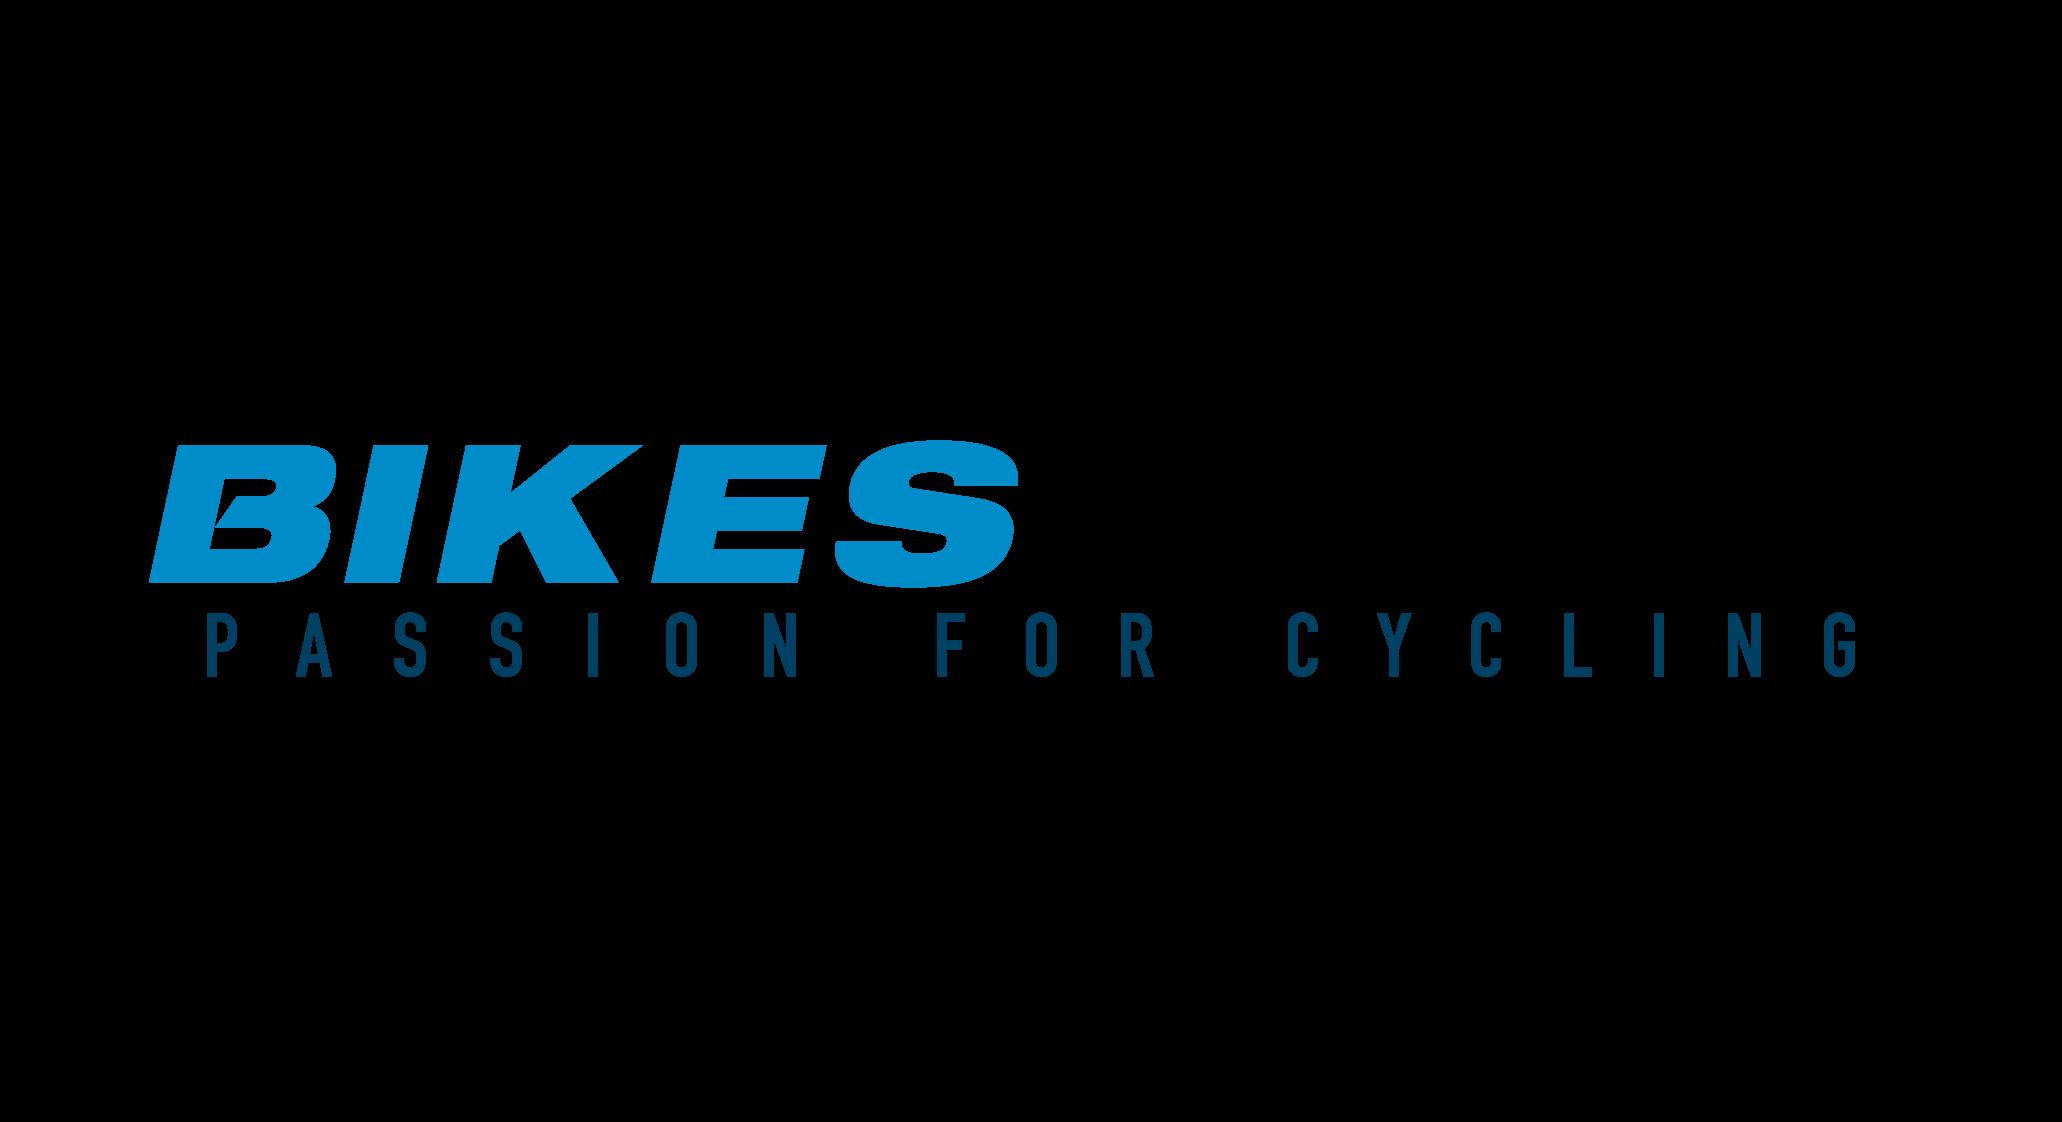 Bikespoint Hoogvliet